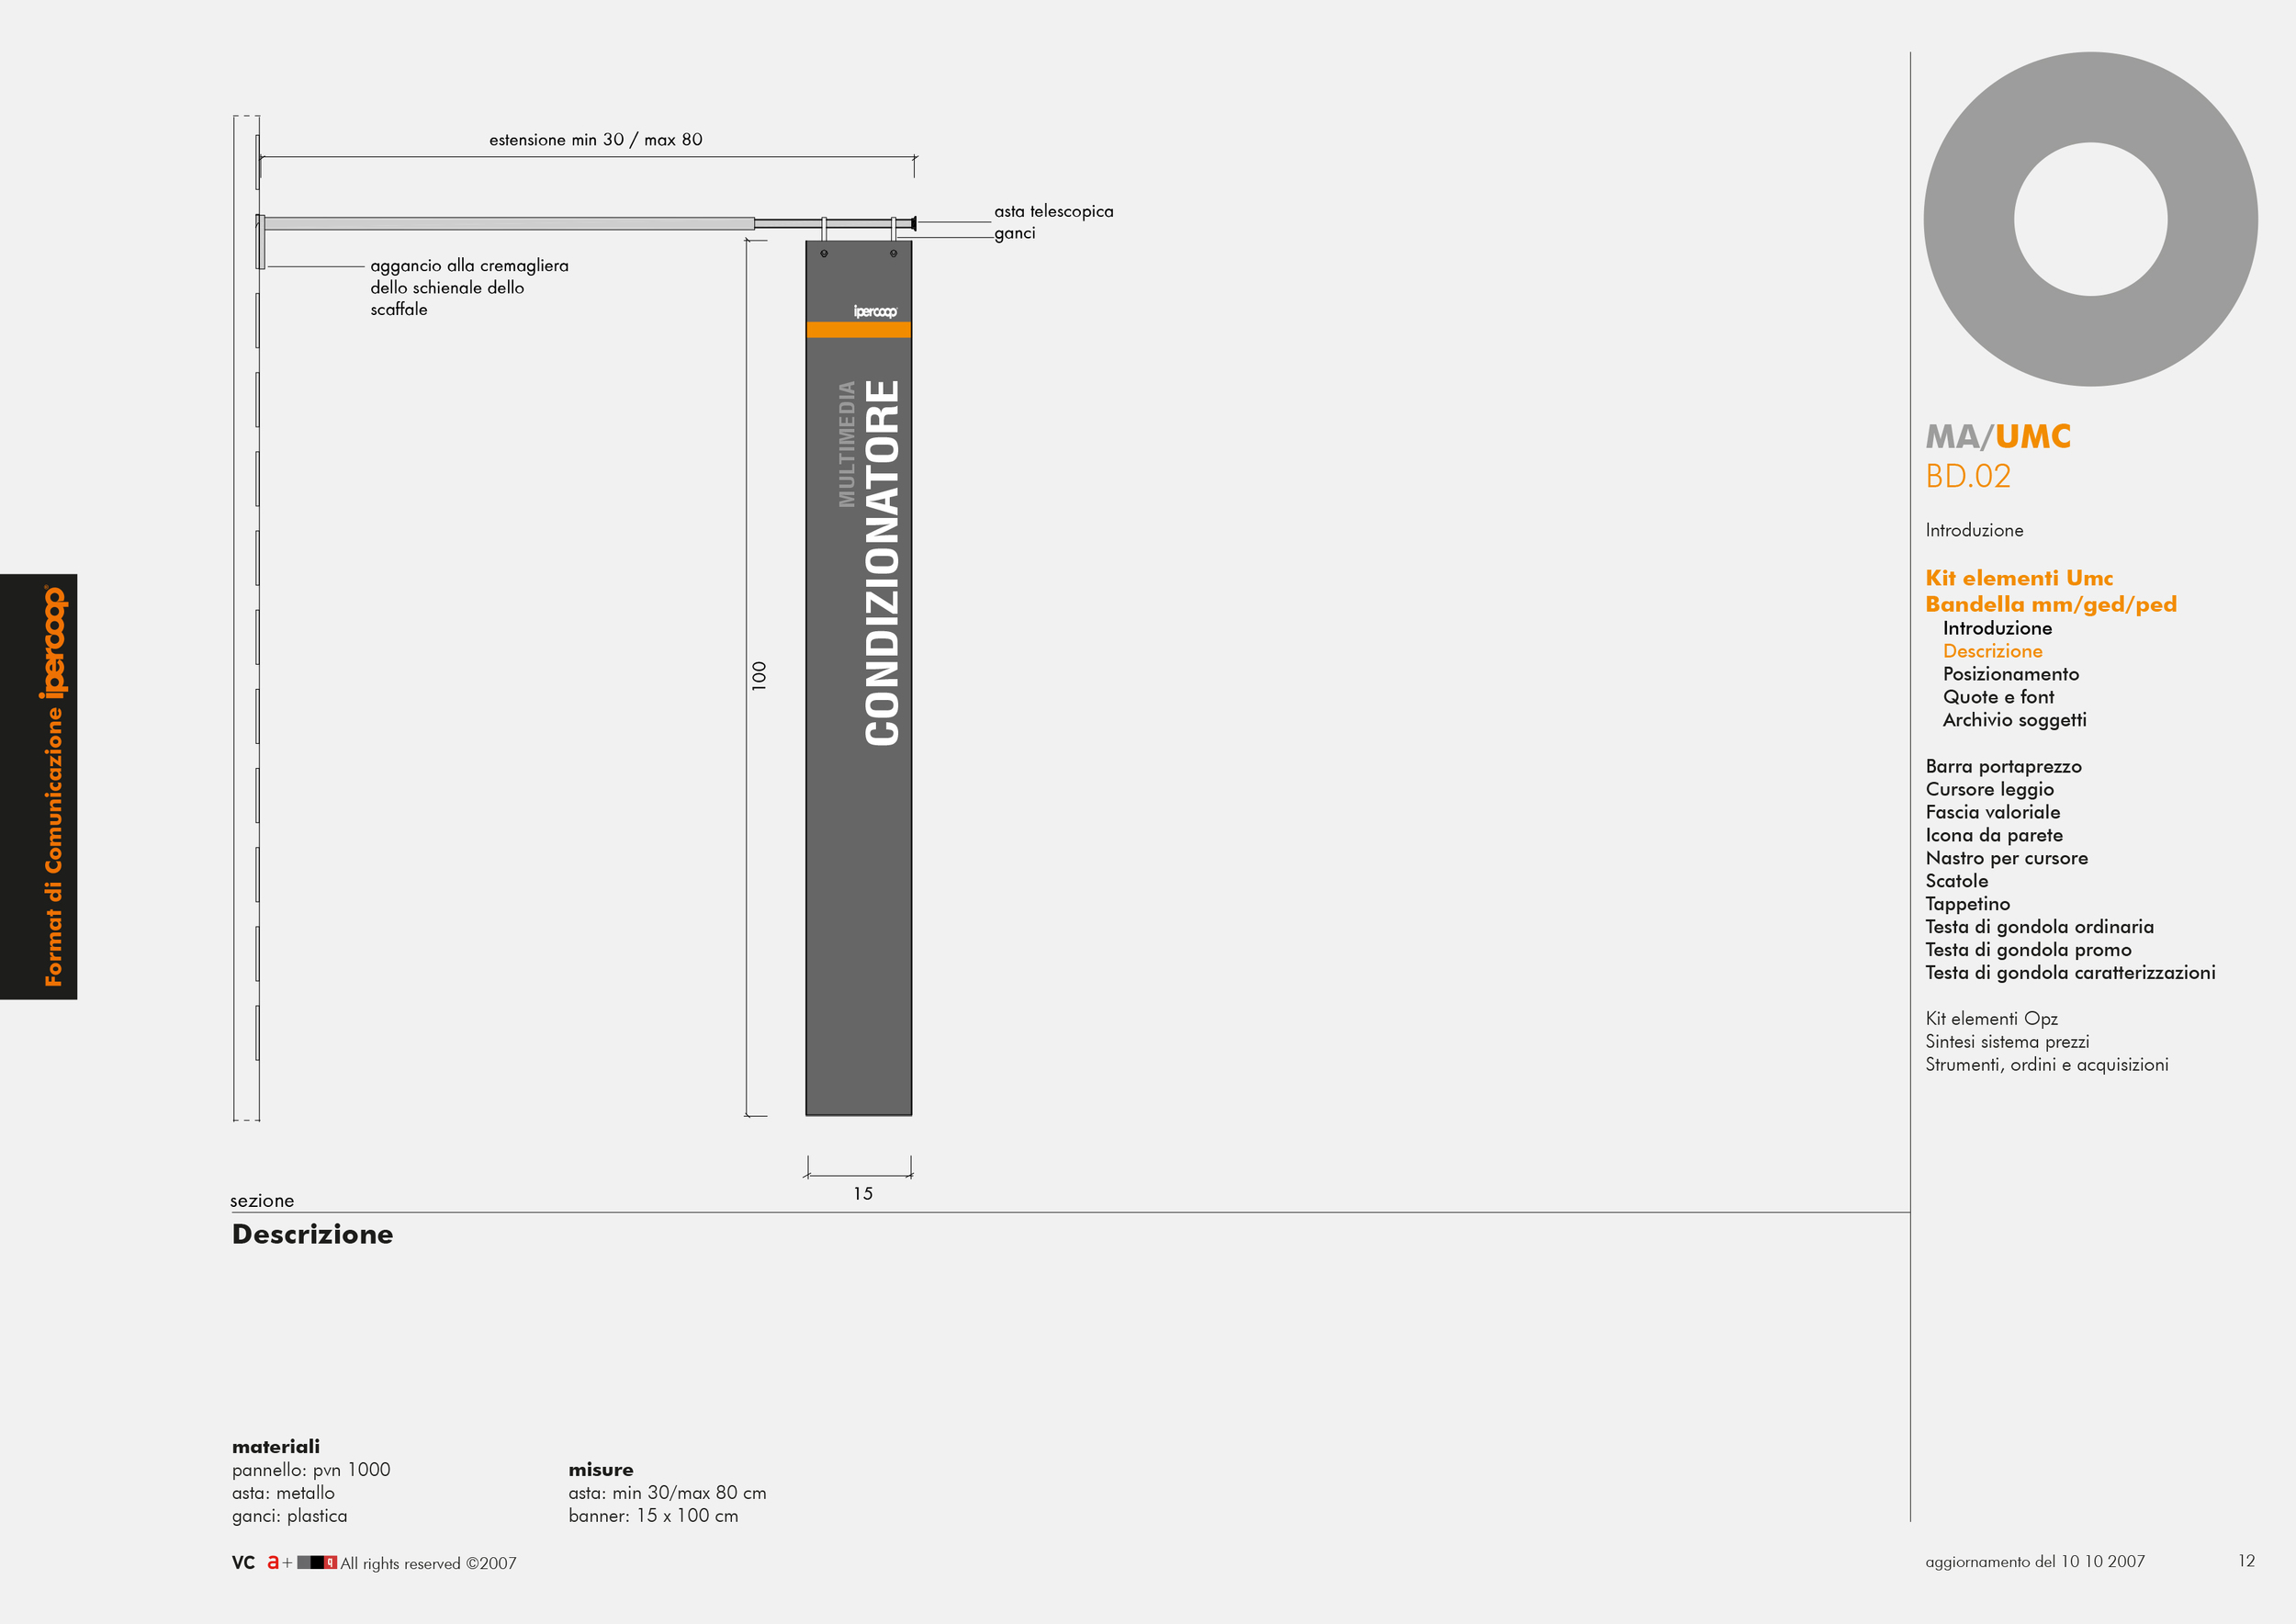 manuale-ALLESTIMENTO-4.jpg